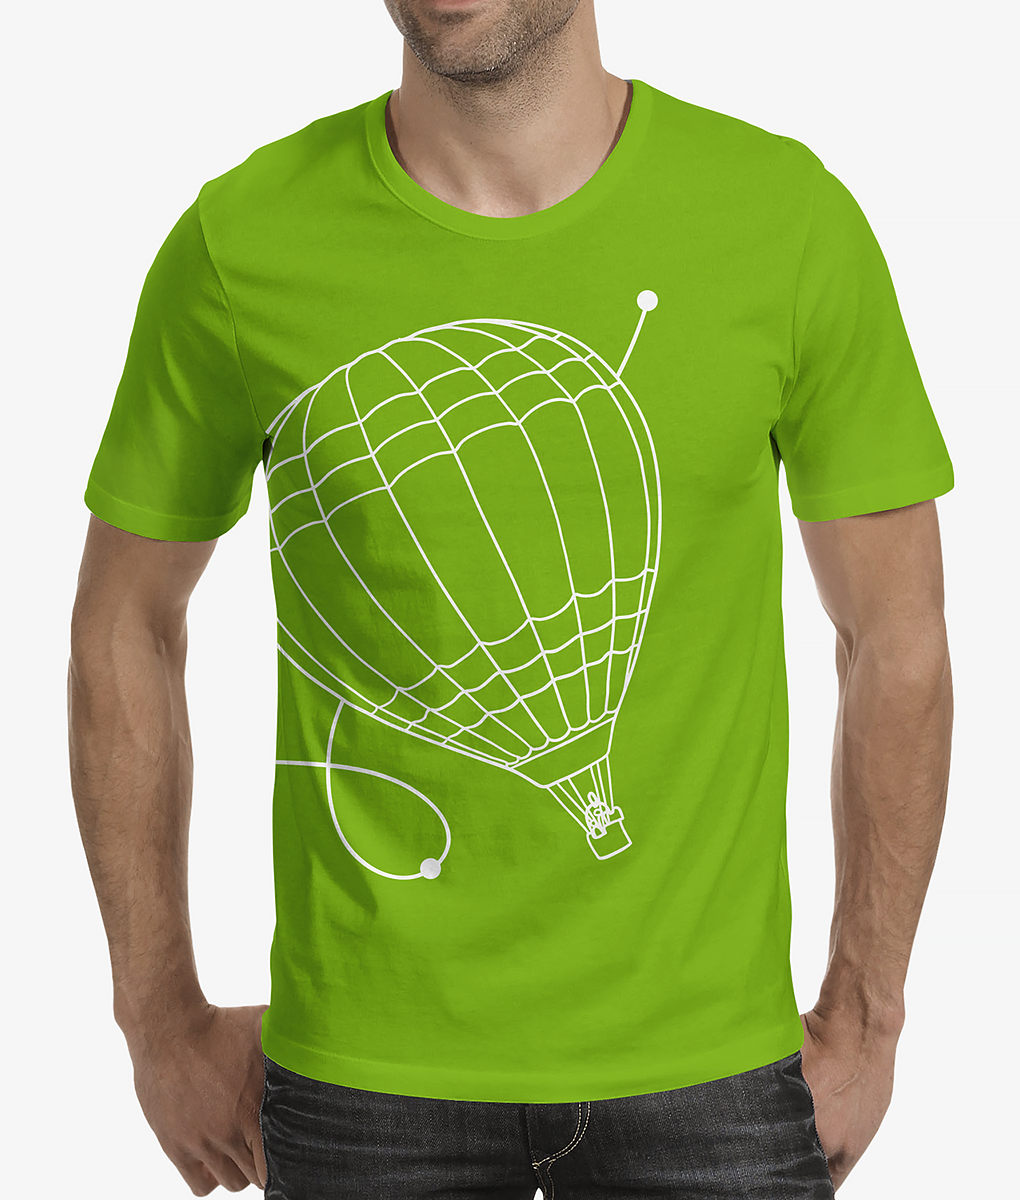 t-shirt_man_1